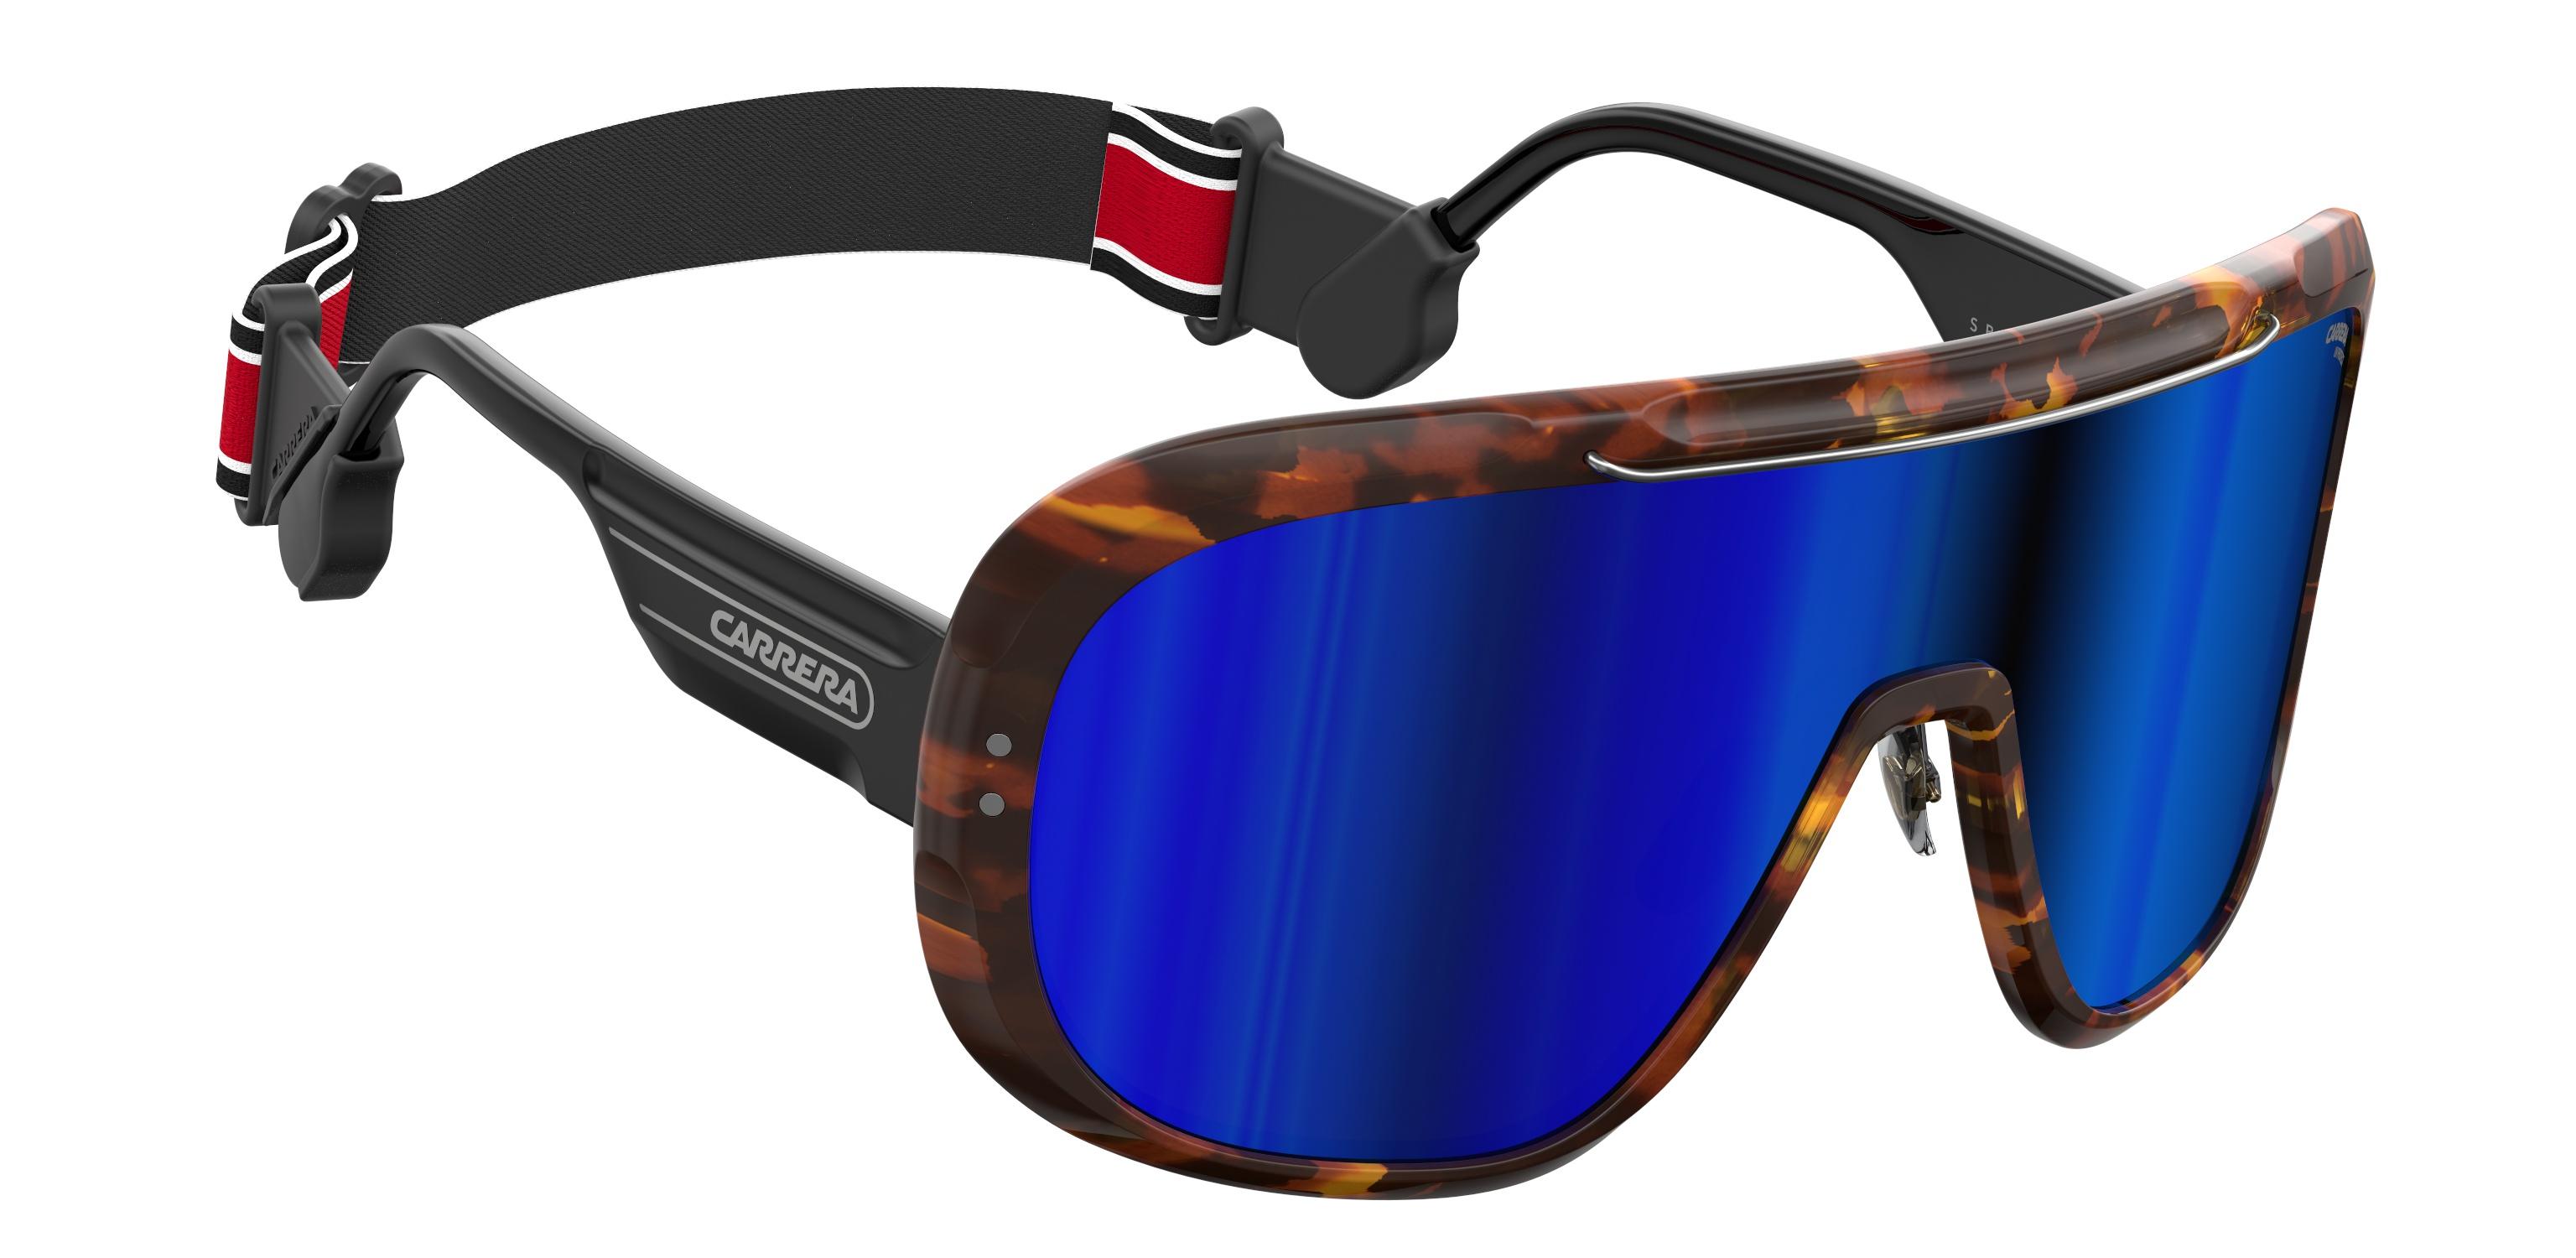 Carrera Epica Special Edition Blonde Havana Oversize Shield Sunglasses 0SCL CU